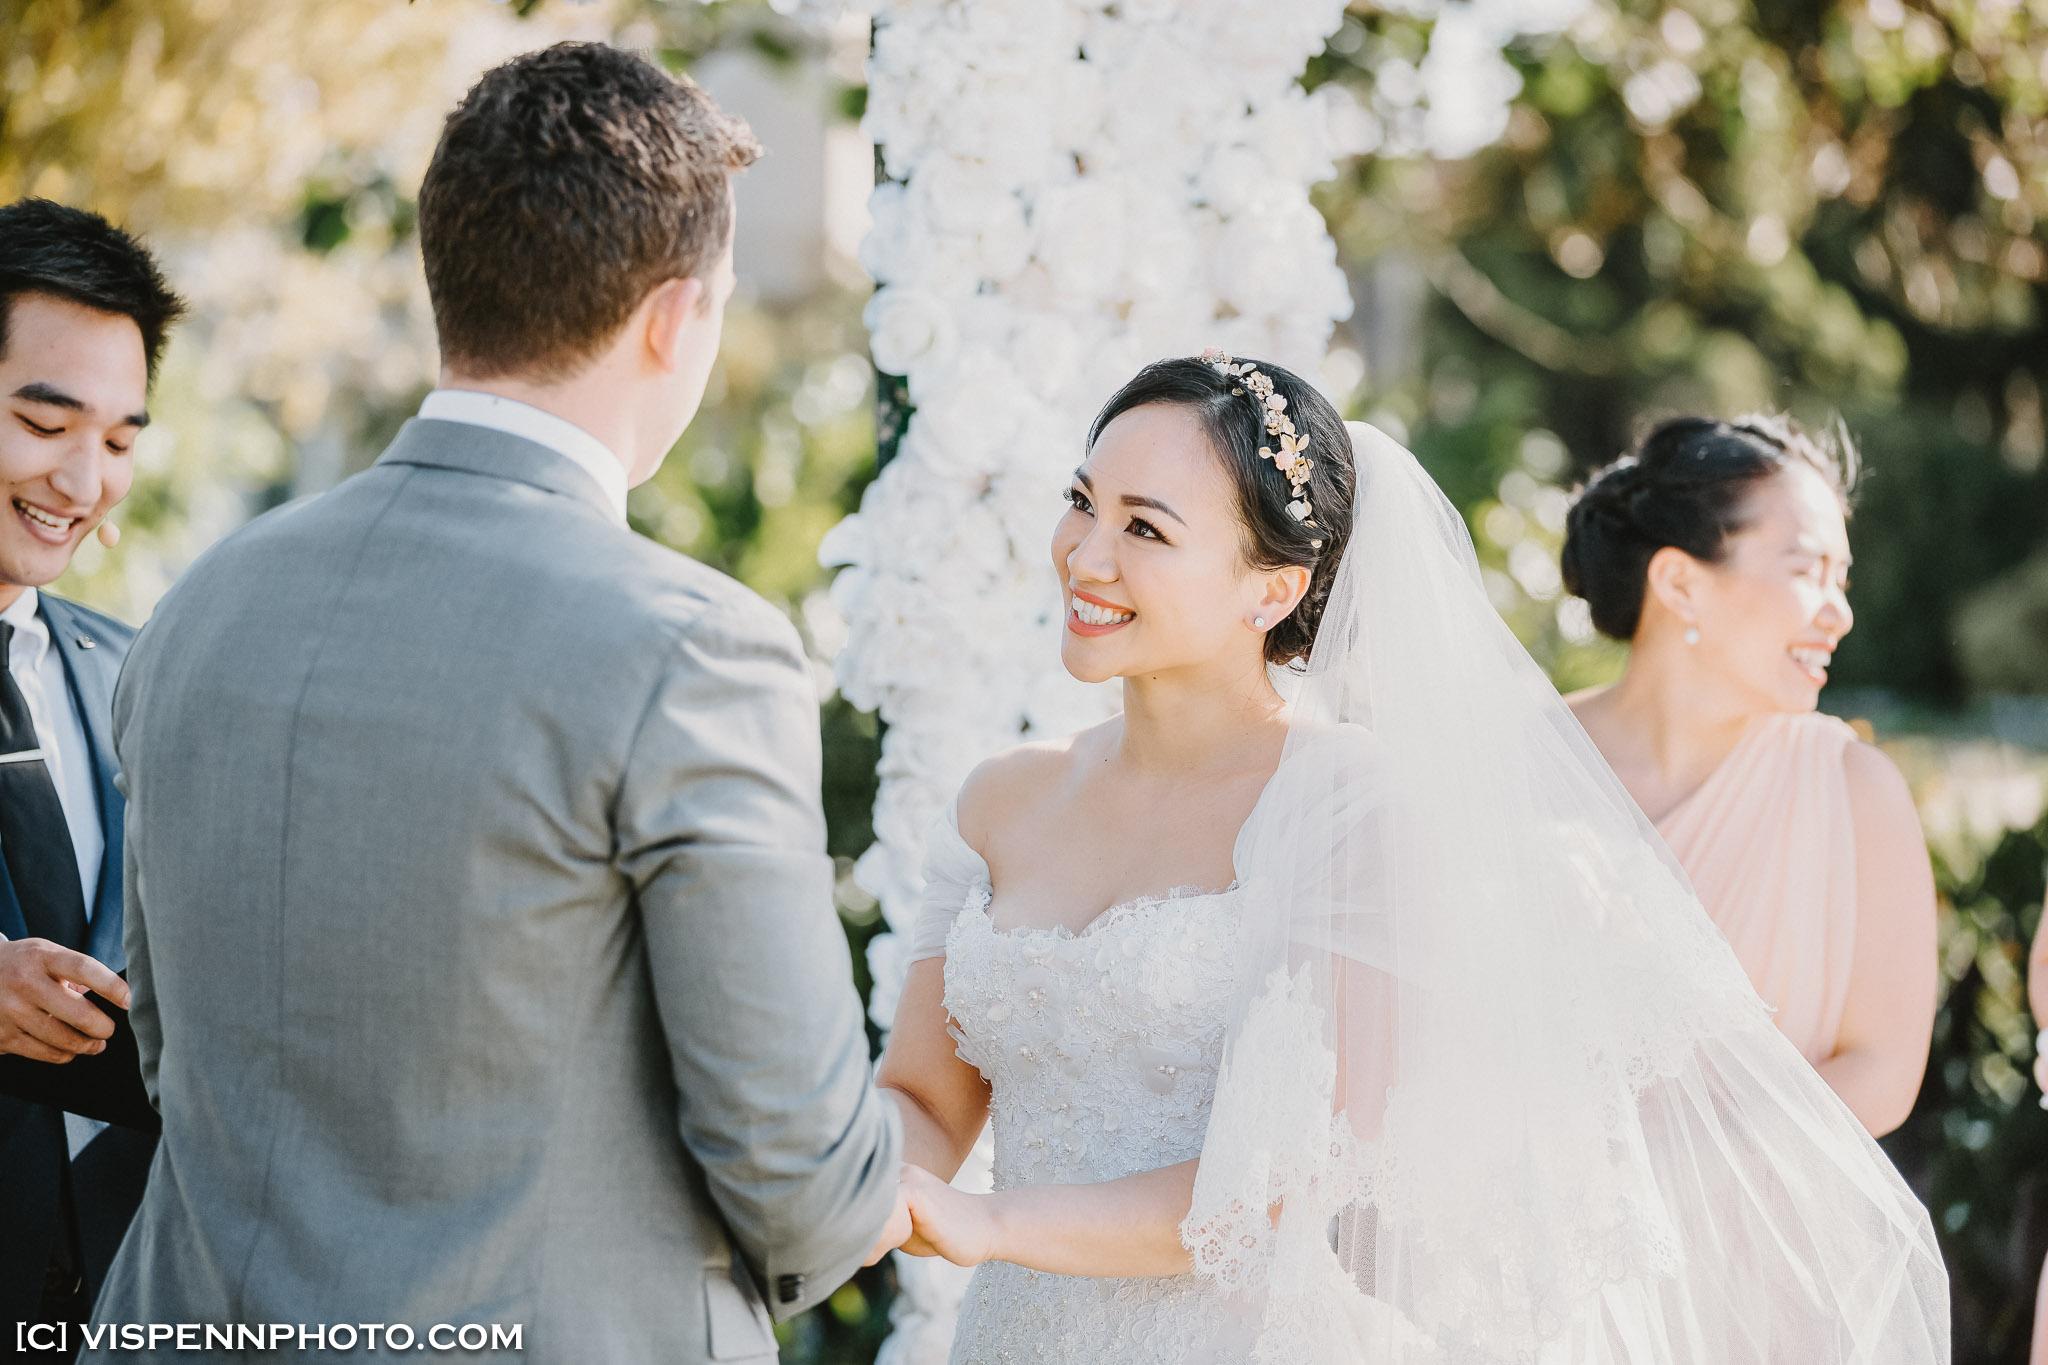 WEDDING DAY Photography Melbourne VISPENN 墨尔本 婚礼跟拍 婚礼摄像 婚礼摄影 结婚照 登记照 VISPENN Kat H1 01539